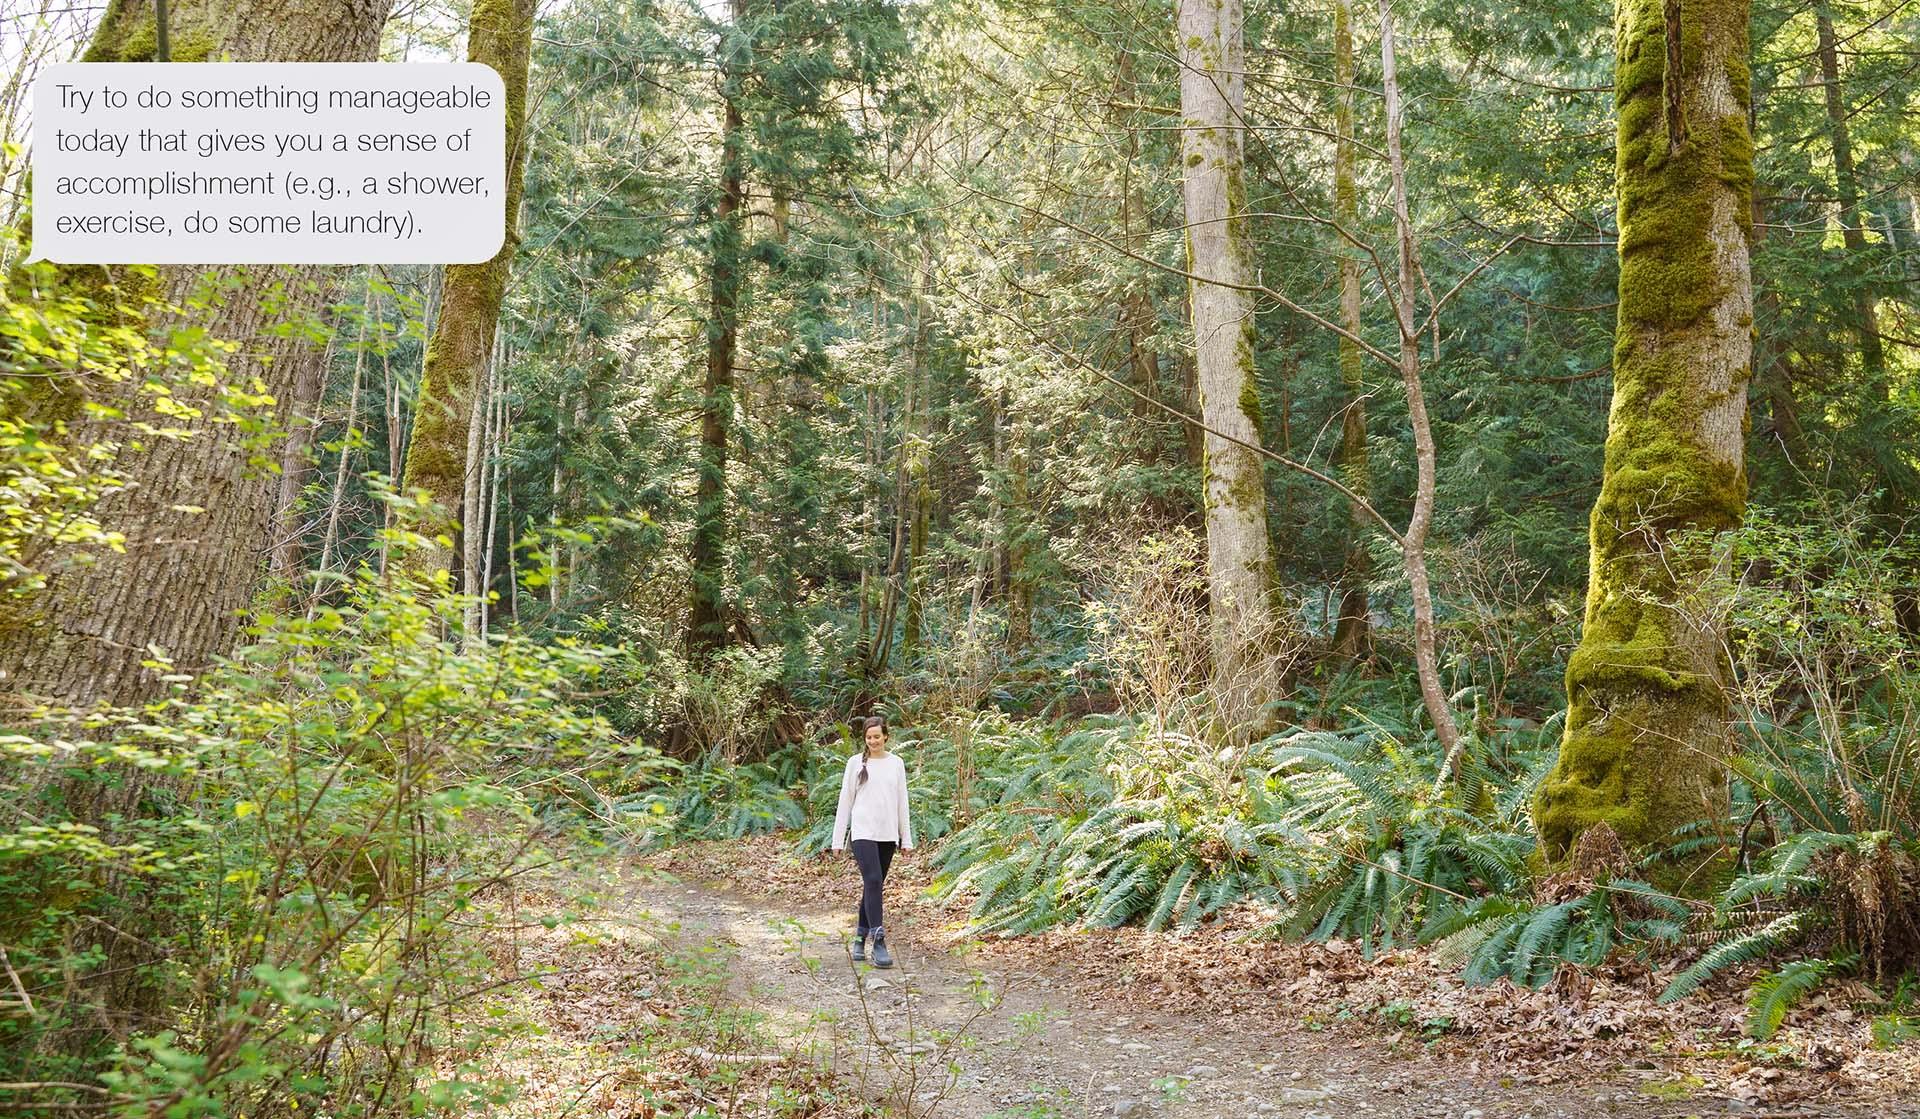 Woman walking along forest path.